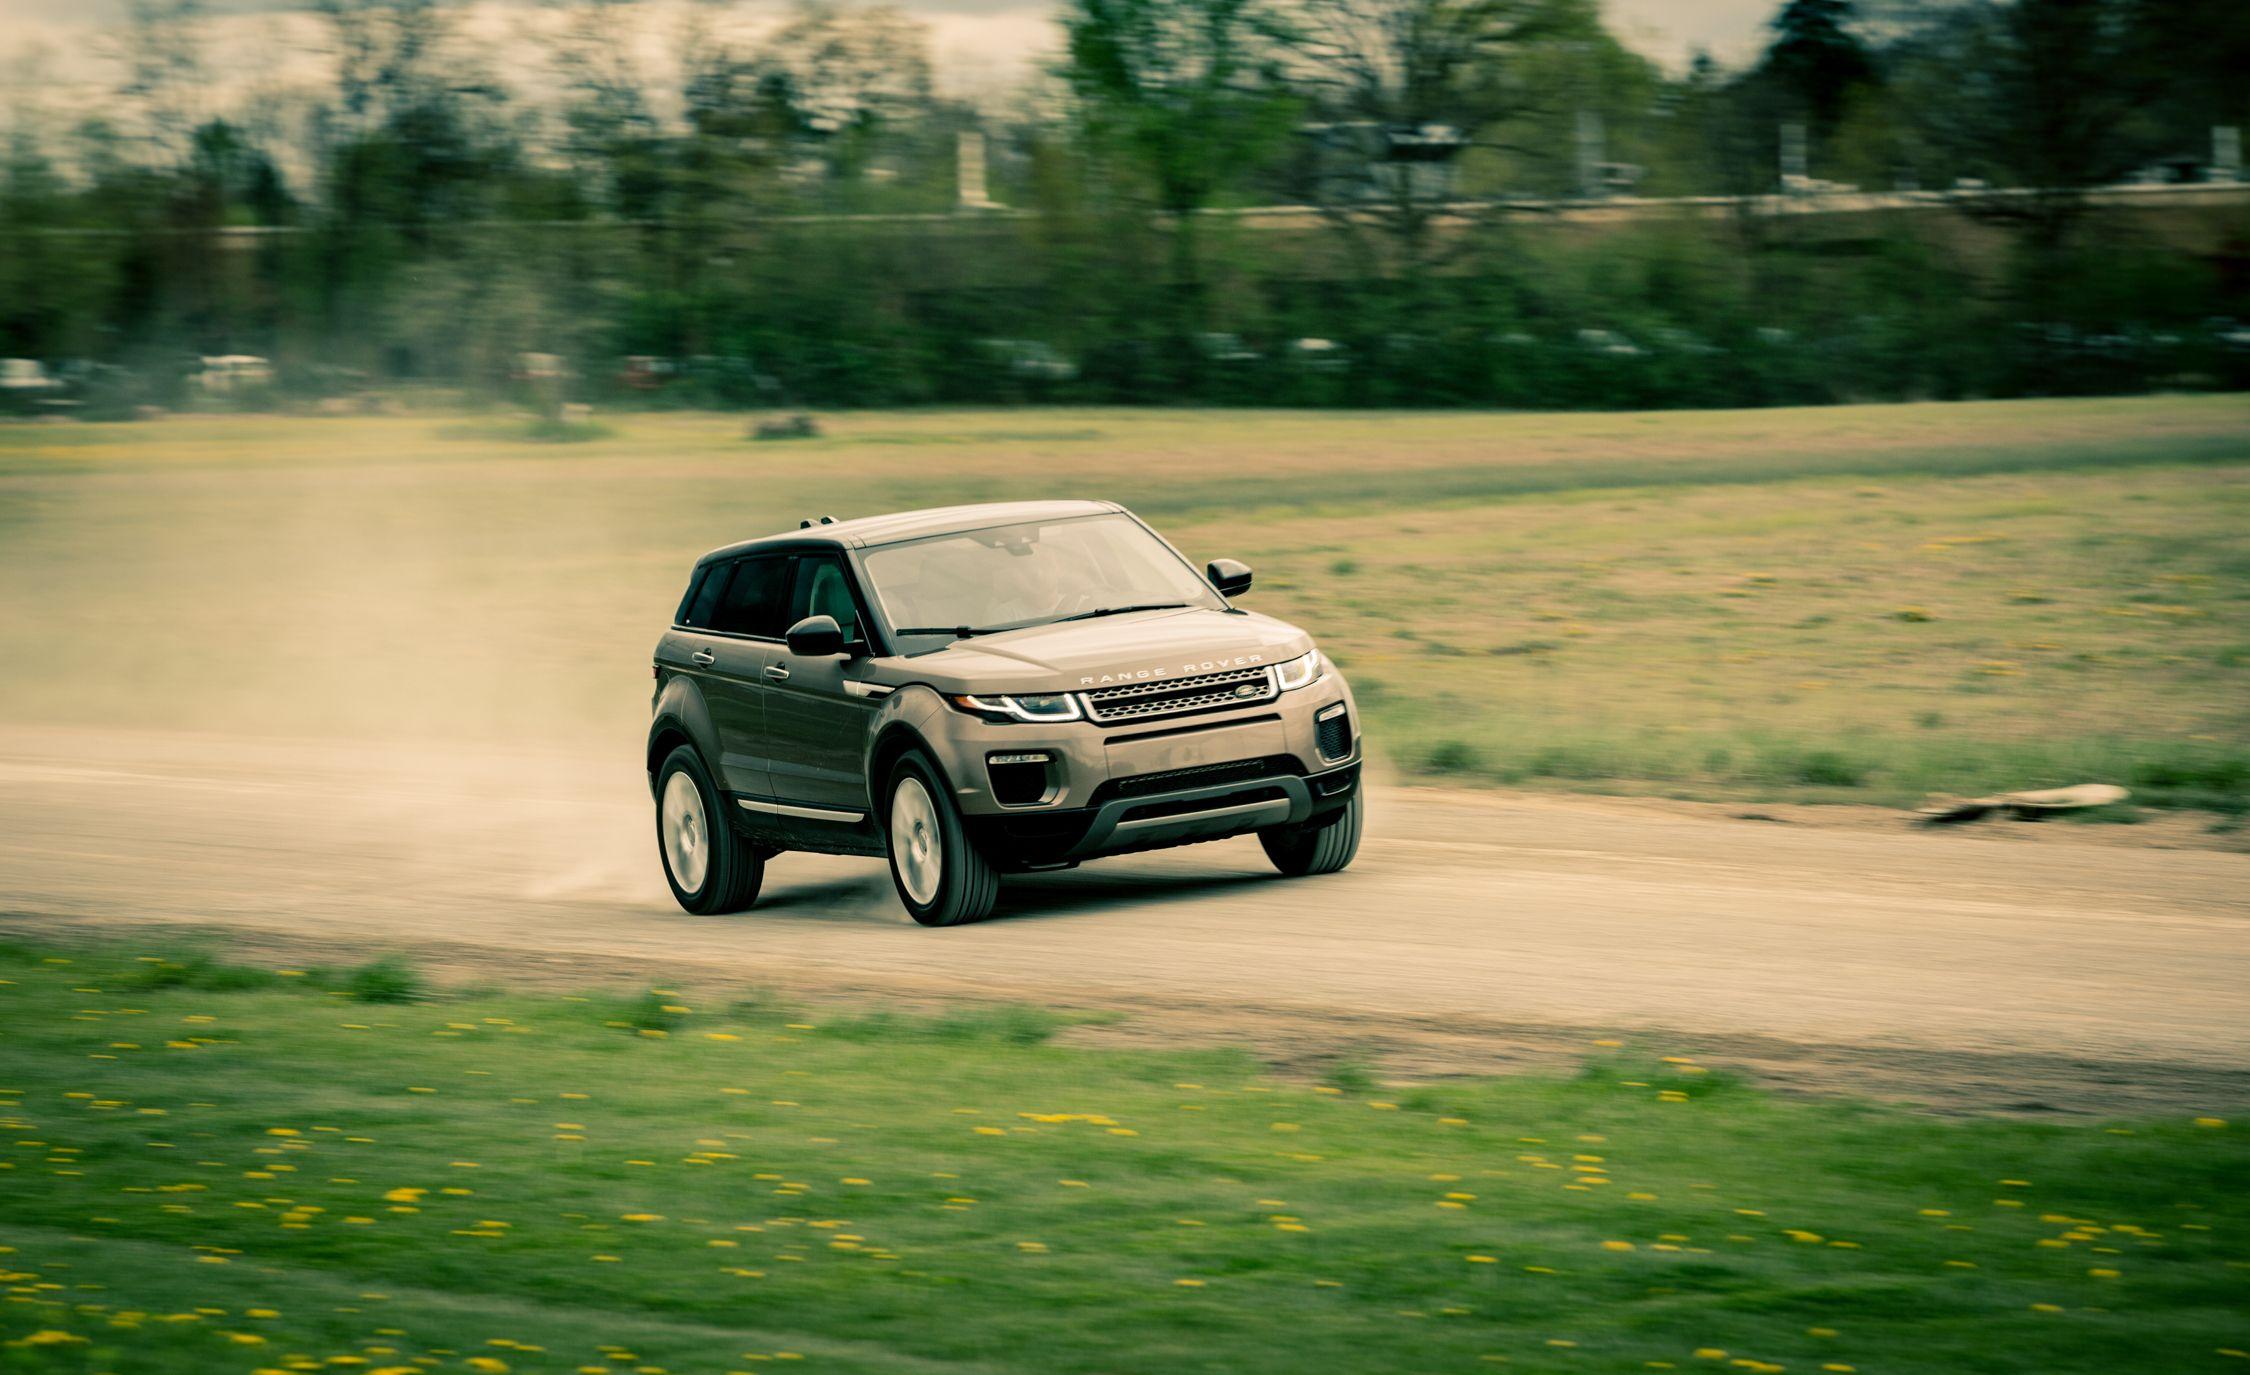 No More Two Door Land Rover Kills Range Rover Evoque Coupe